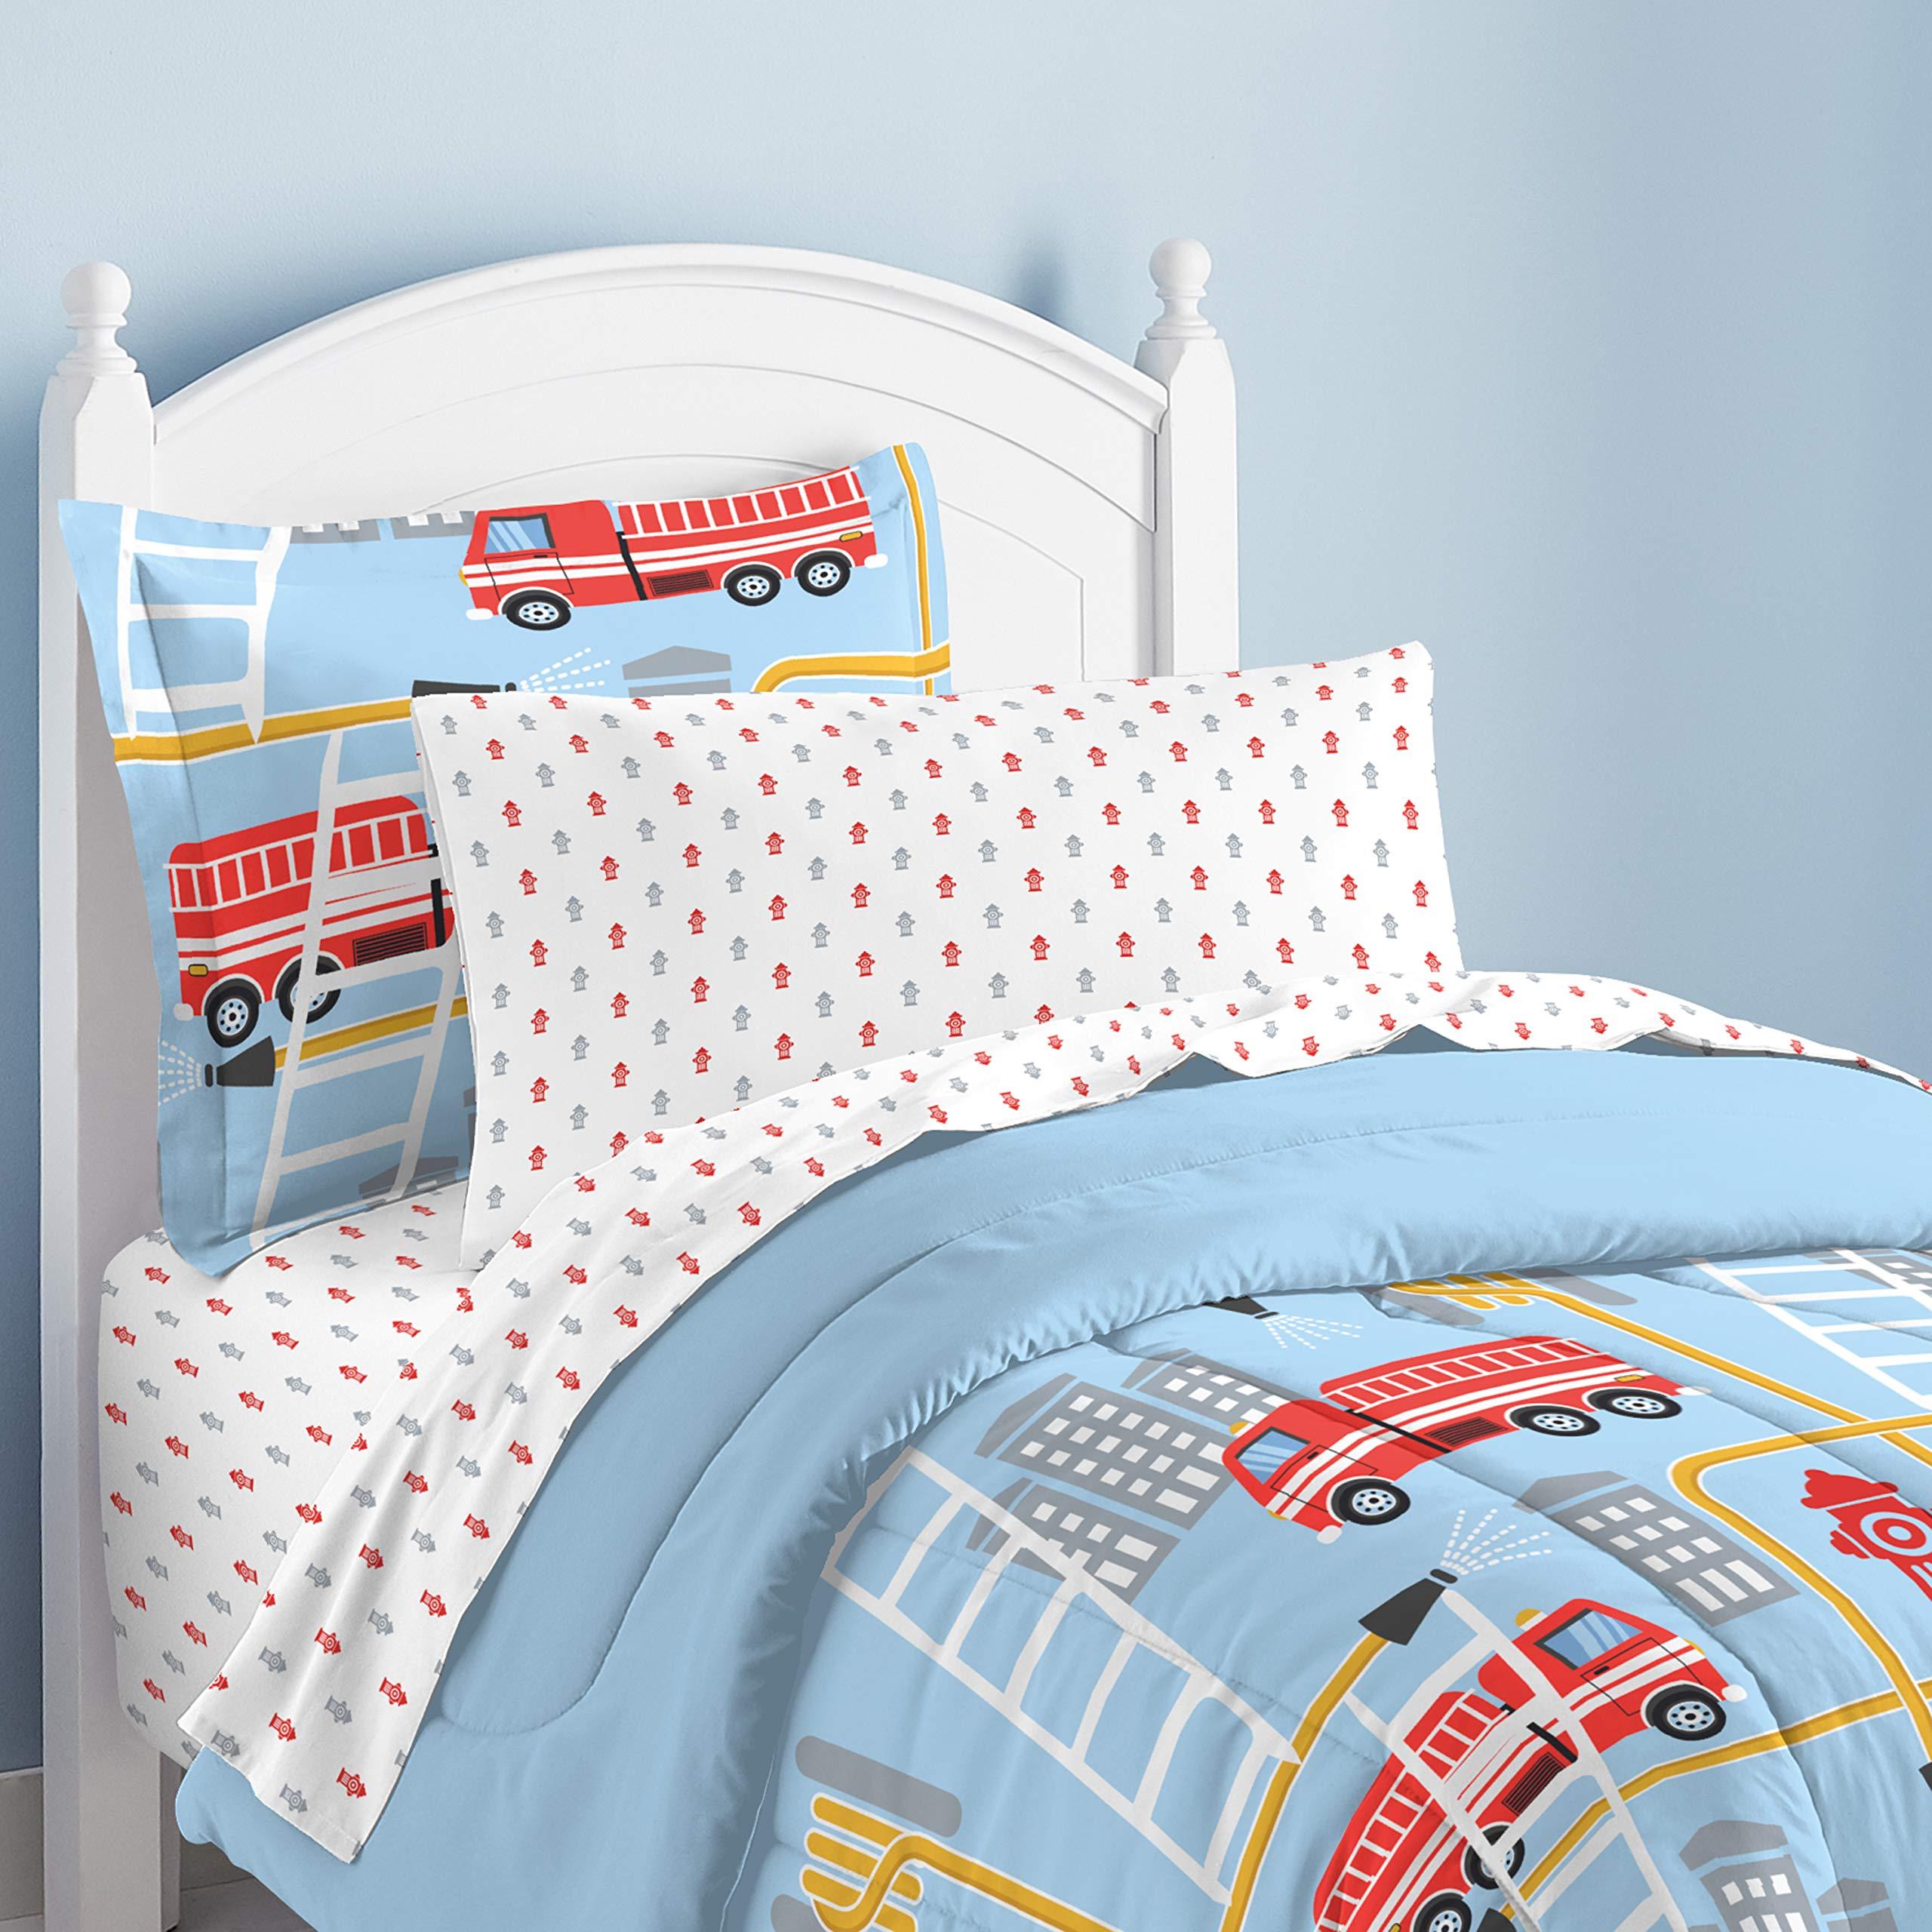 Taxi Firetruck Ambulance Pillowcases Boys Birthday Gift Blue Pillowcases Bedding Police Emergency Vehicles